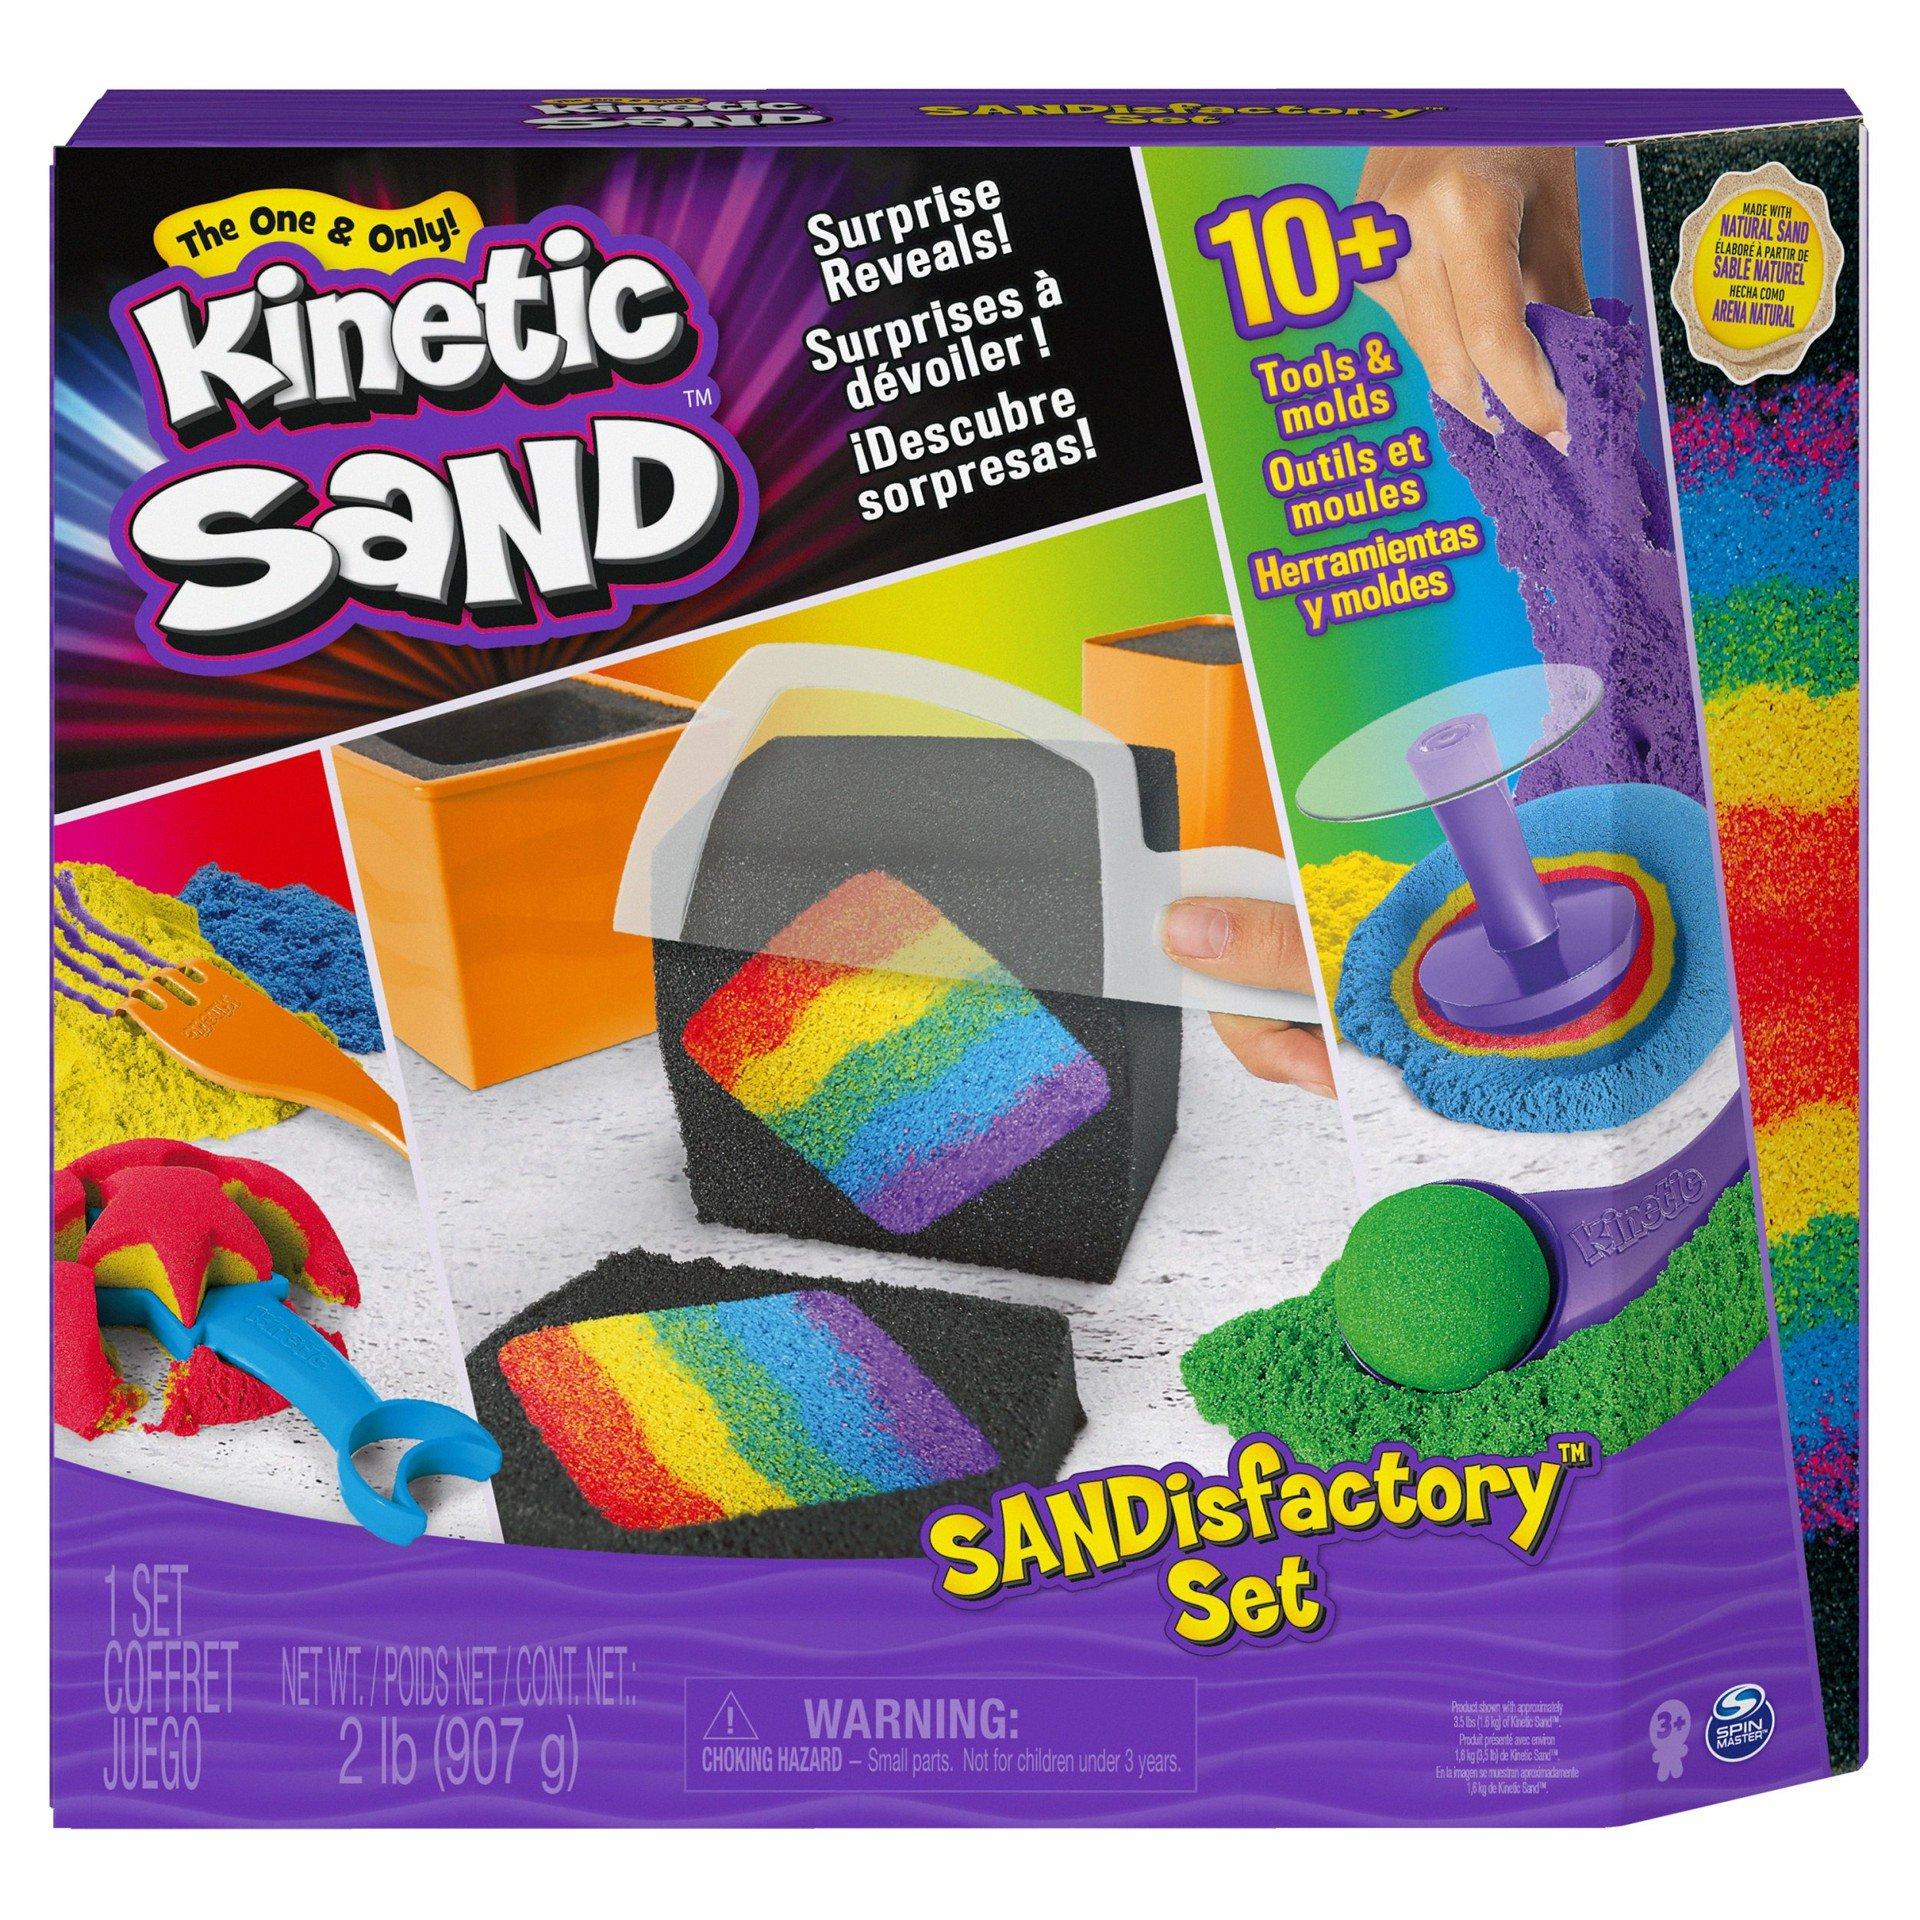 Kinectic Sand Sandisfactory Sæt